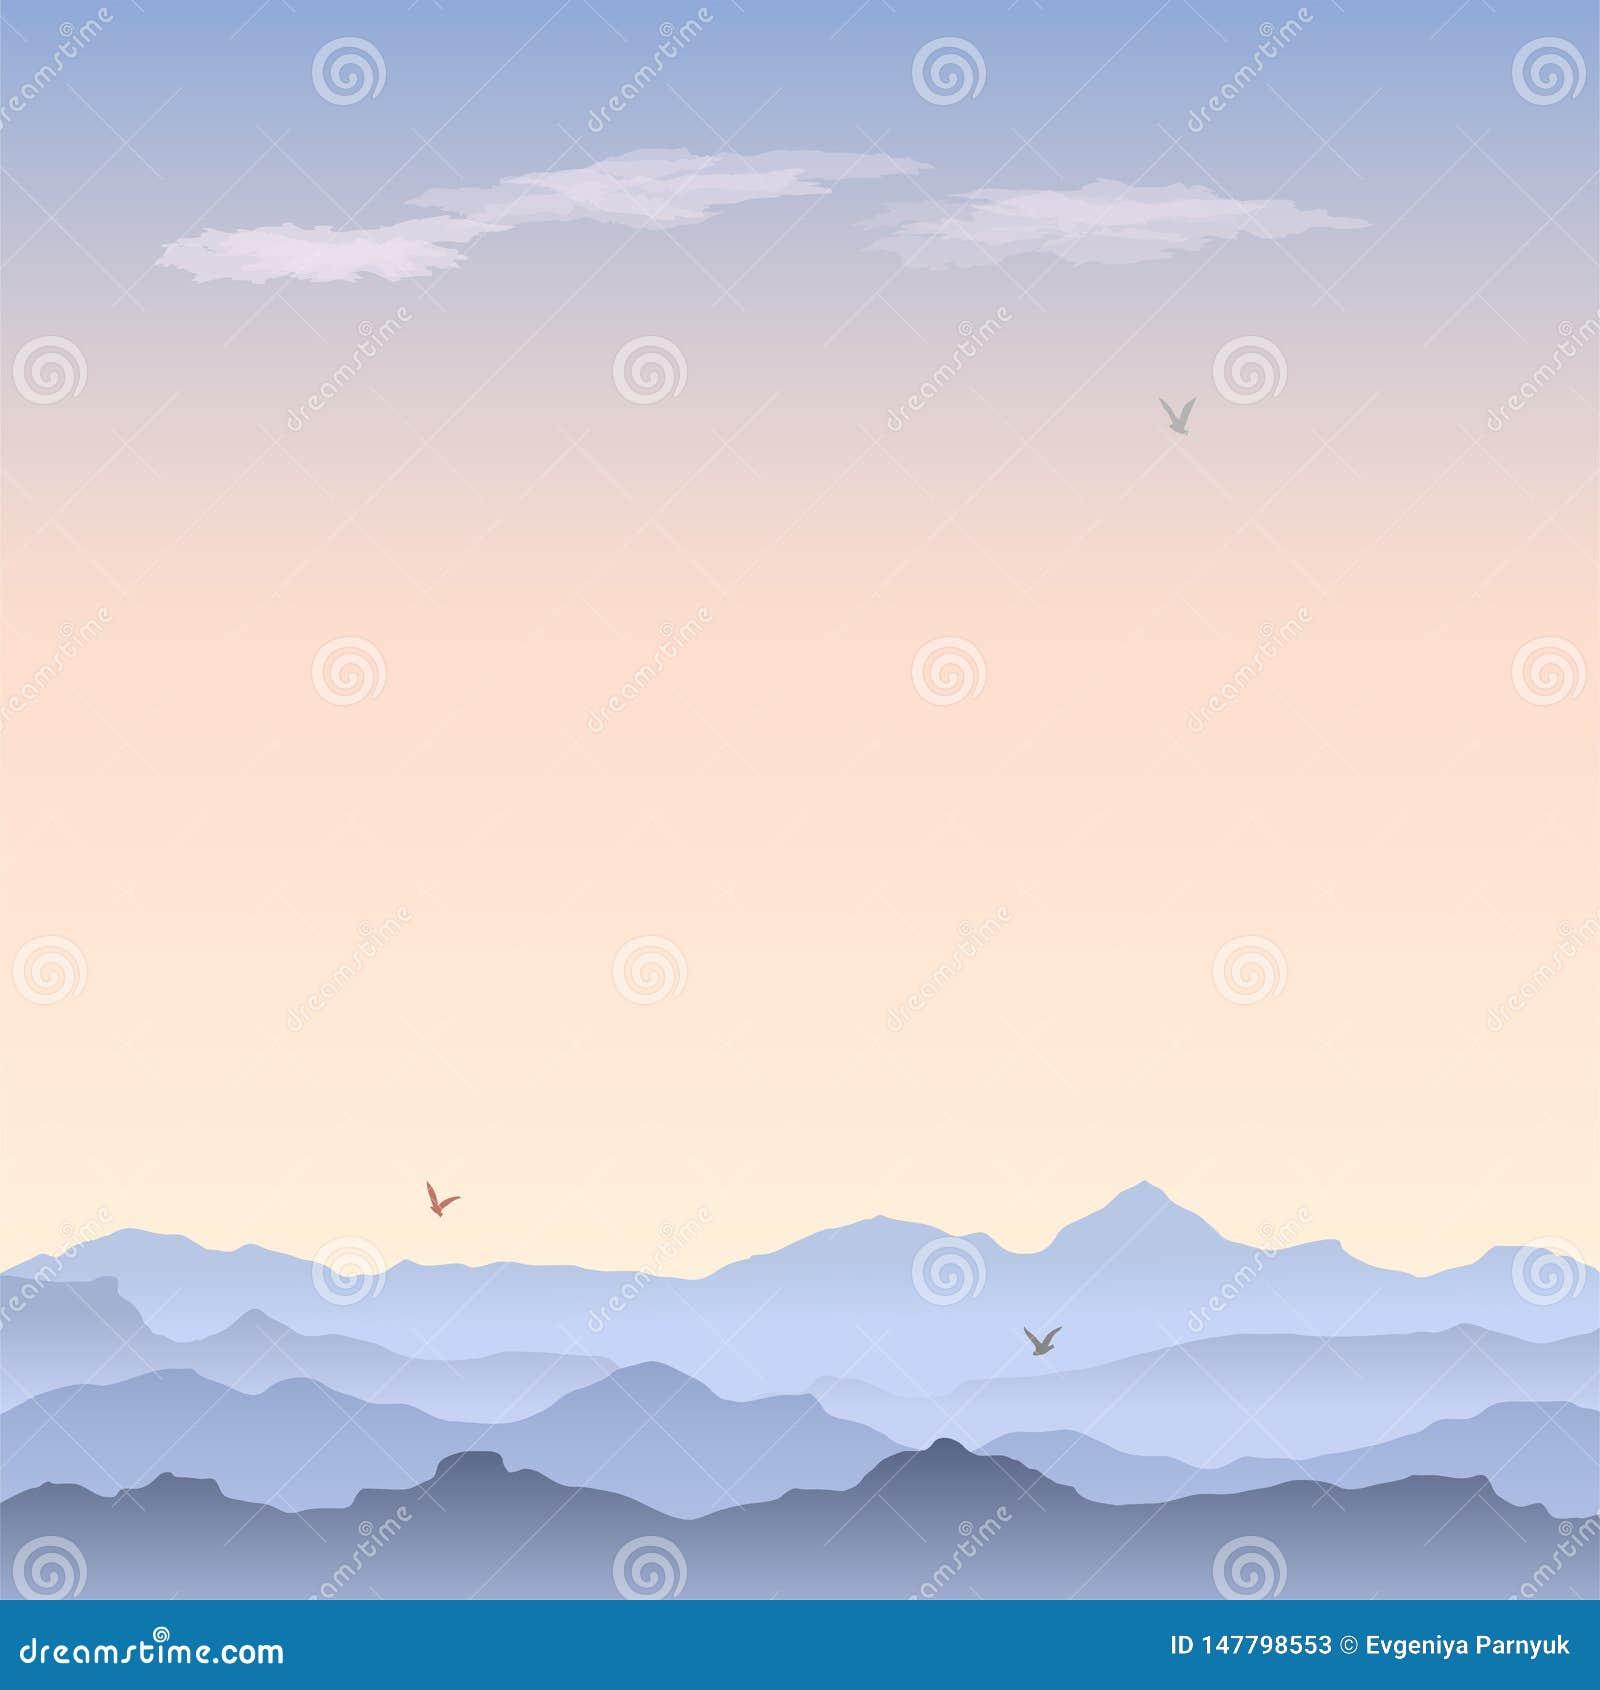 Vektorgrußkarte mit Berglandschaft